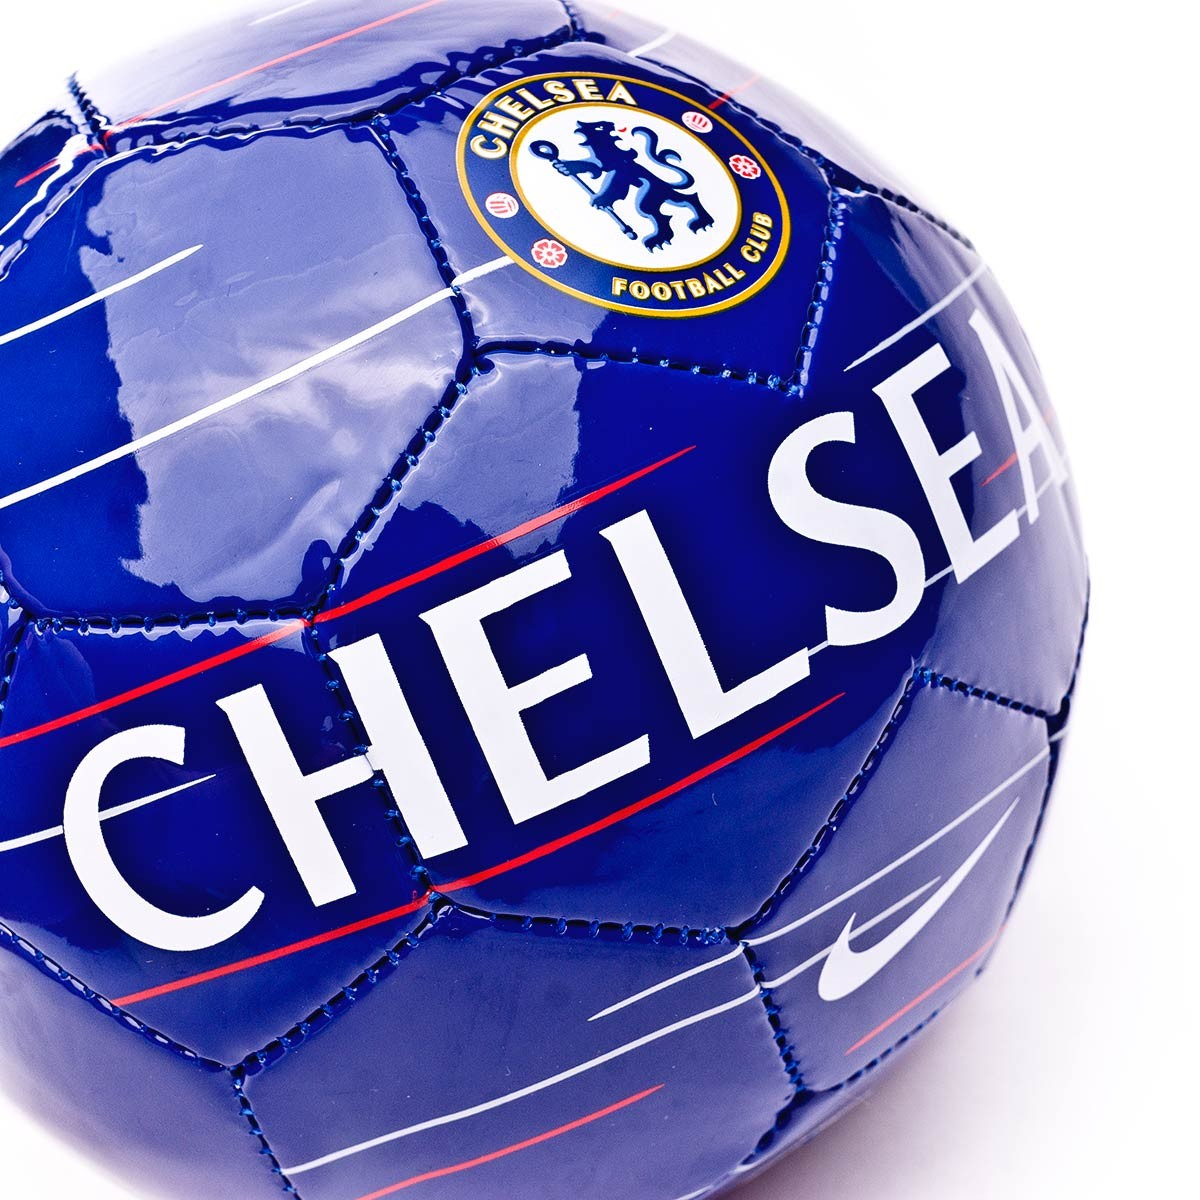 Balón Nike Mini Chelsea FC Skills 2018-2019 Rush blue-White - Soloporteros  es ahora Fútbol Emotion b45183301f9c4